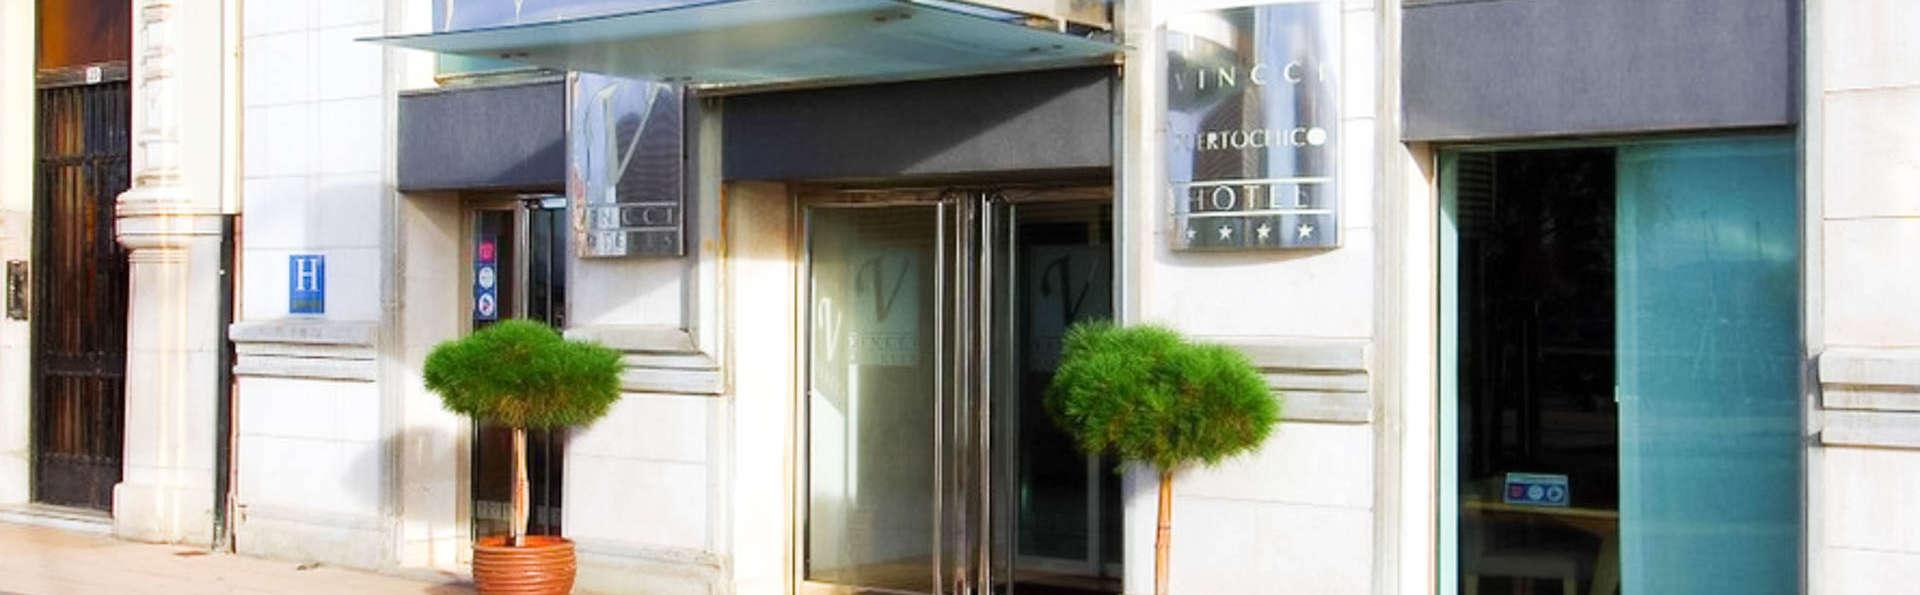 Hotel Vincci Puertochico - EDIT_FRONT-2.jpg